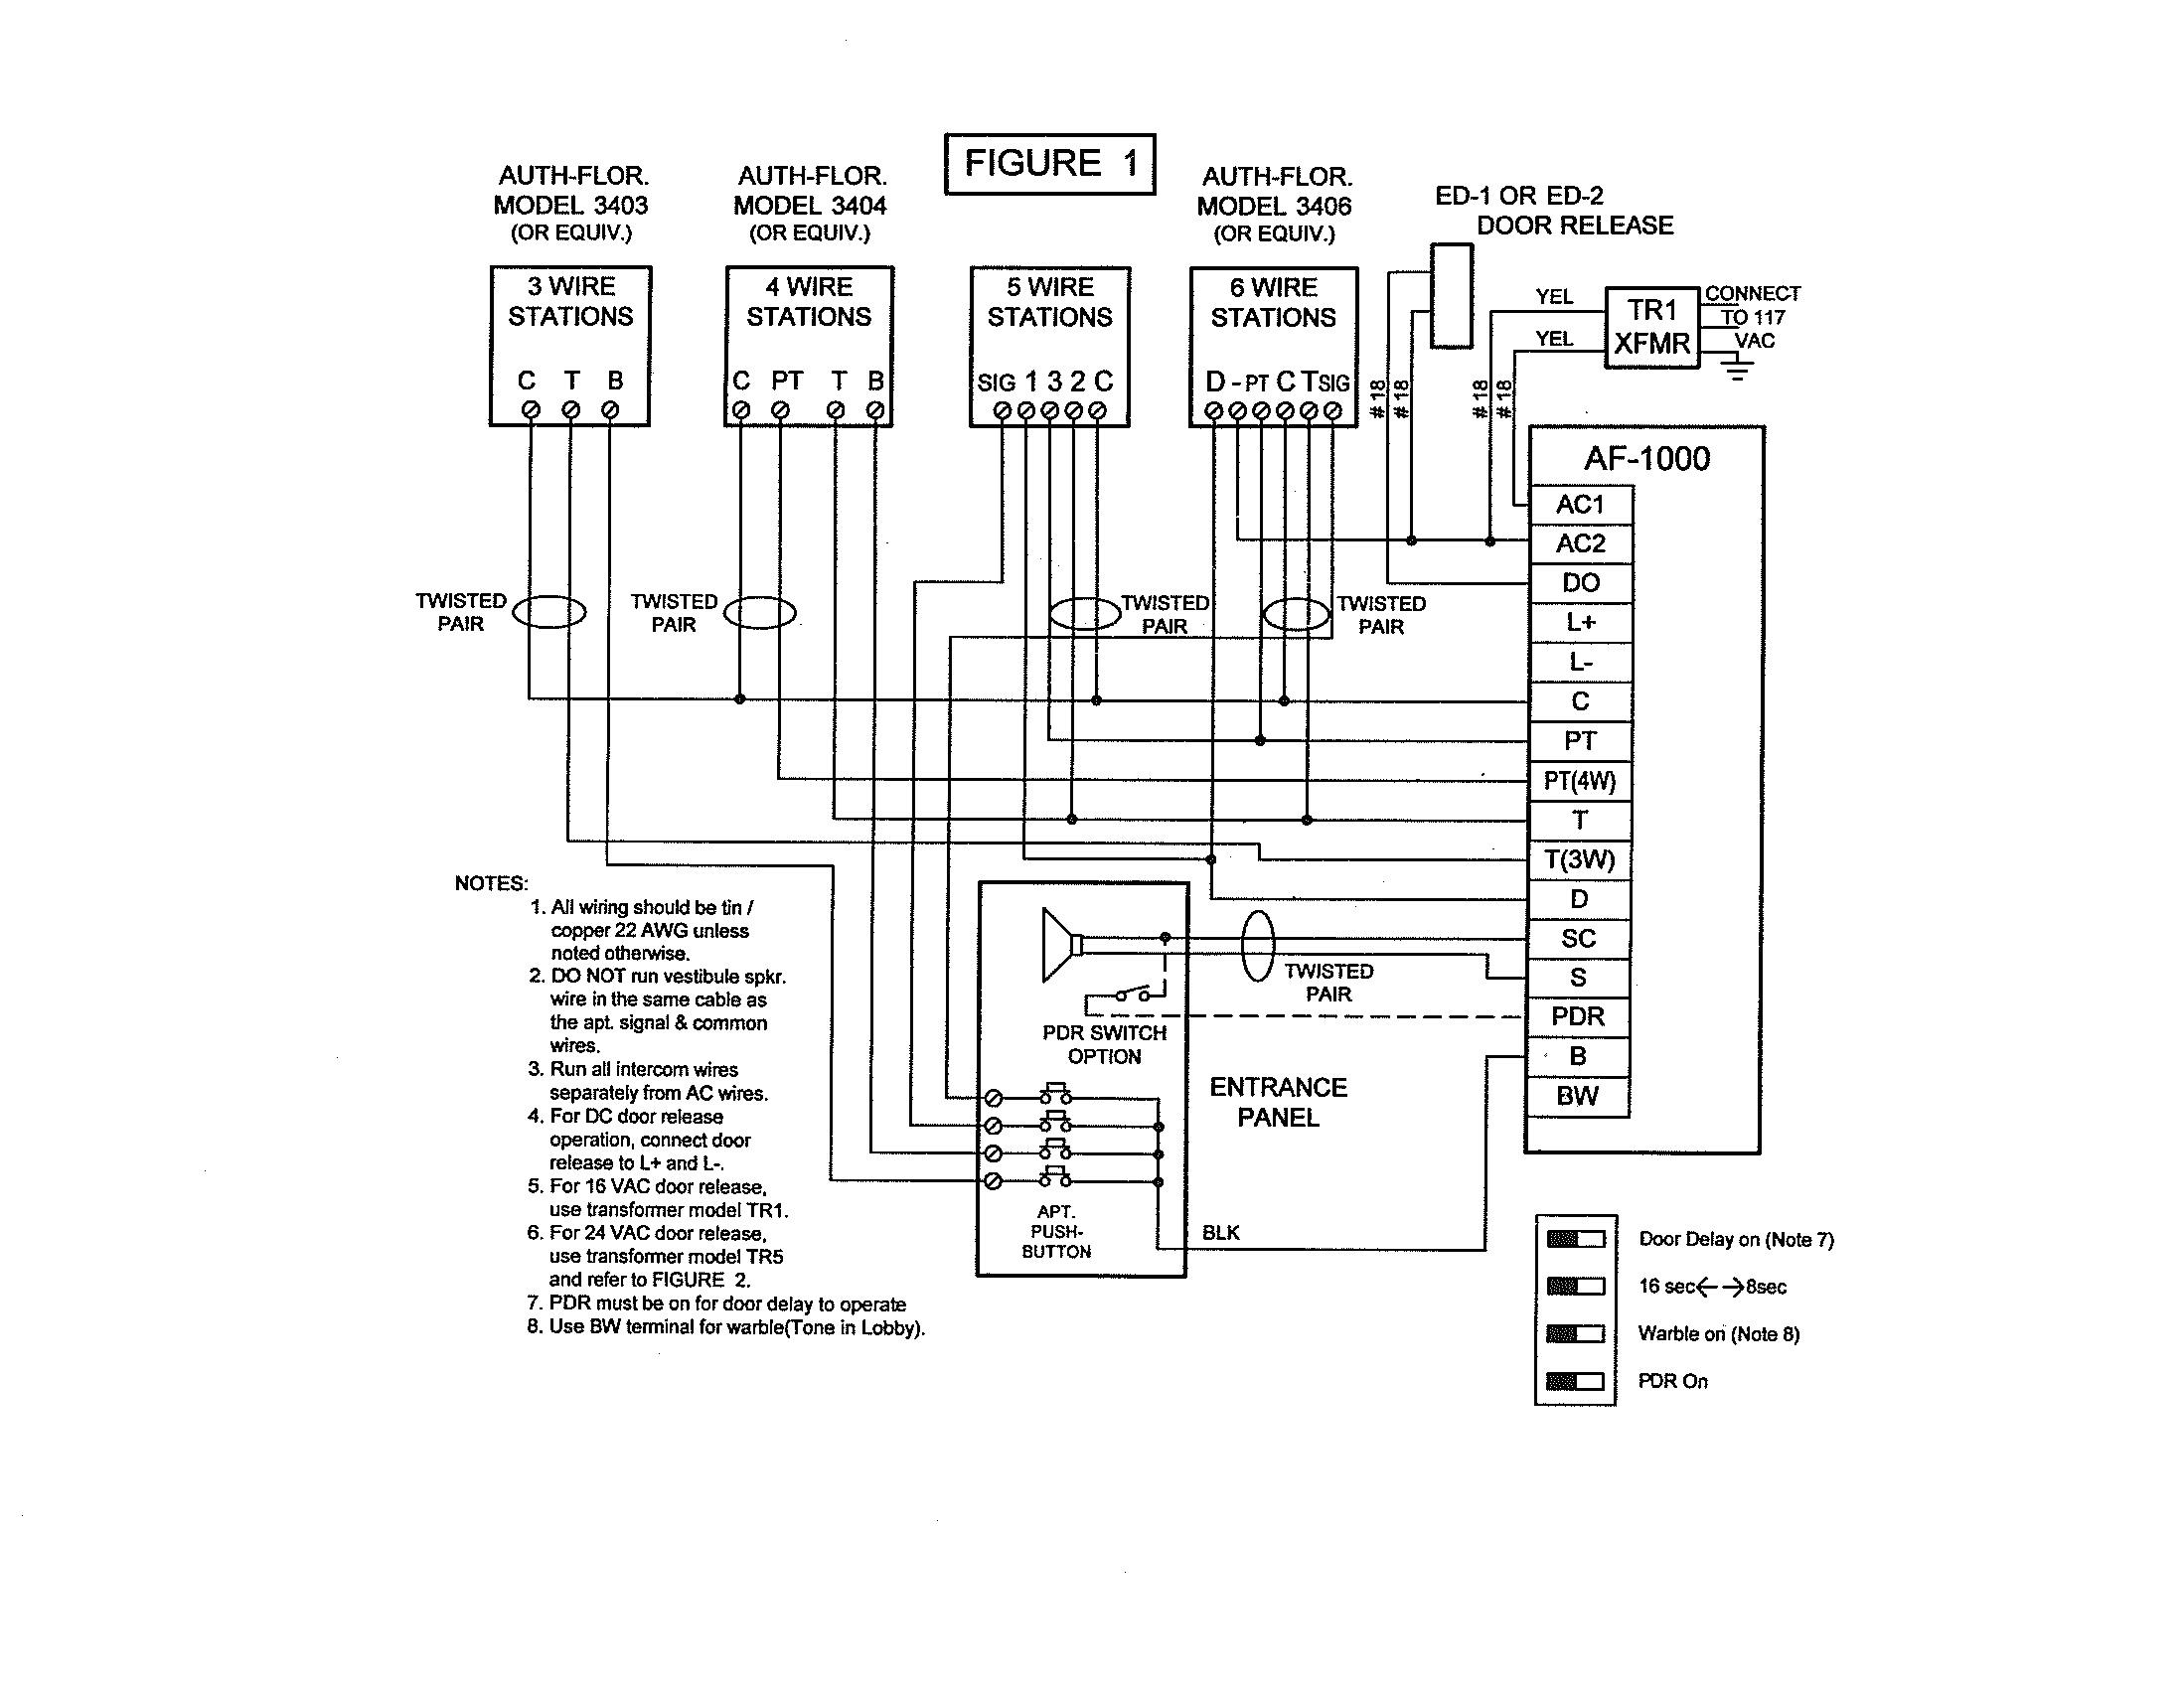 aiphone lef 5 wiring diagram wiring diagram article review aiphone lef 3 wiring diagram wiring diagram